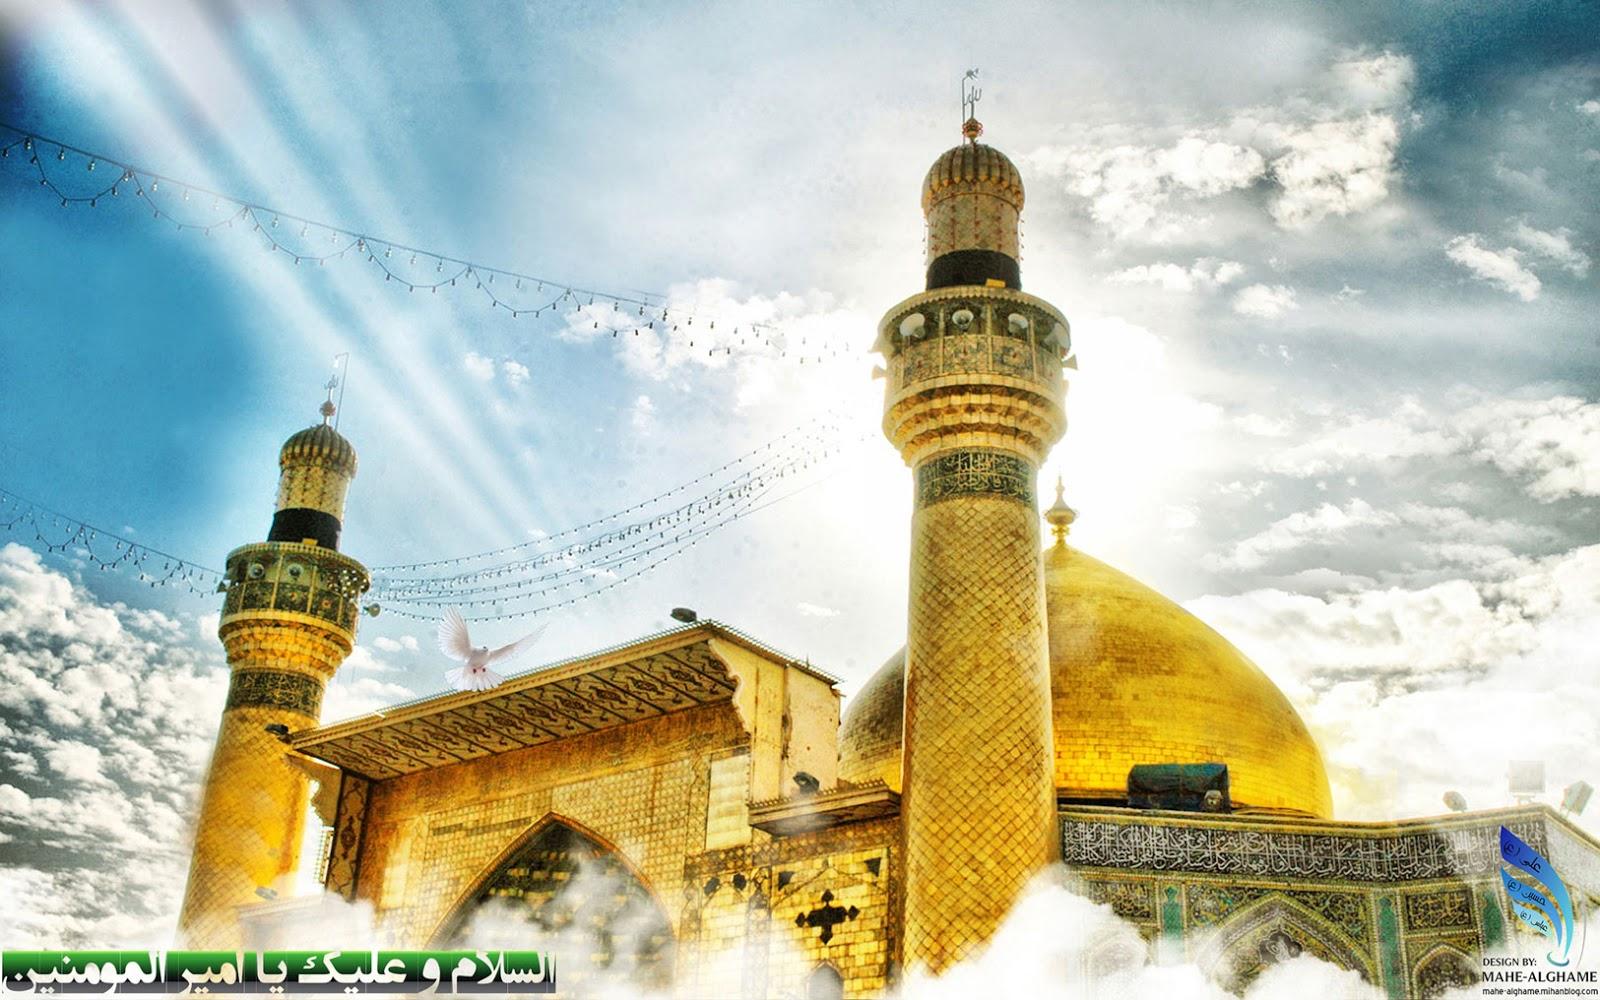 Maula Ali Shrine Wallpaper: Chak 36 N.B: Roza Imam Hussain A.s Picture